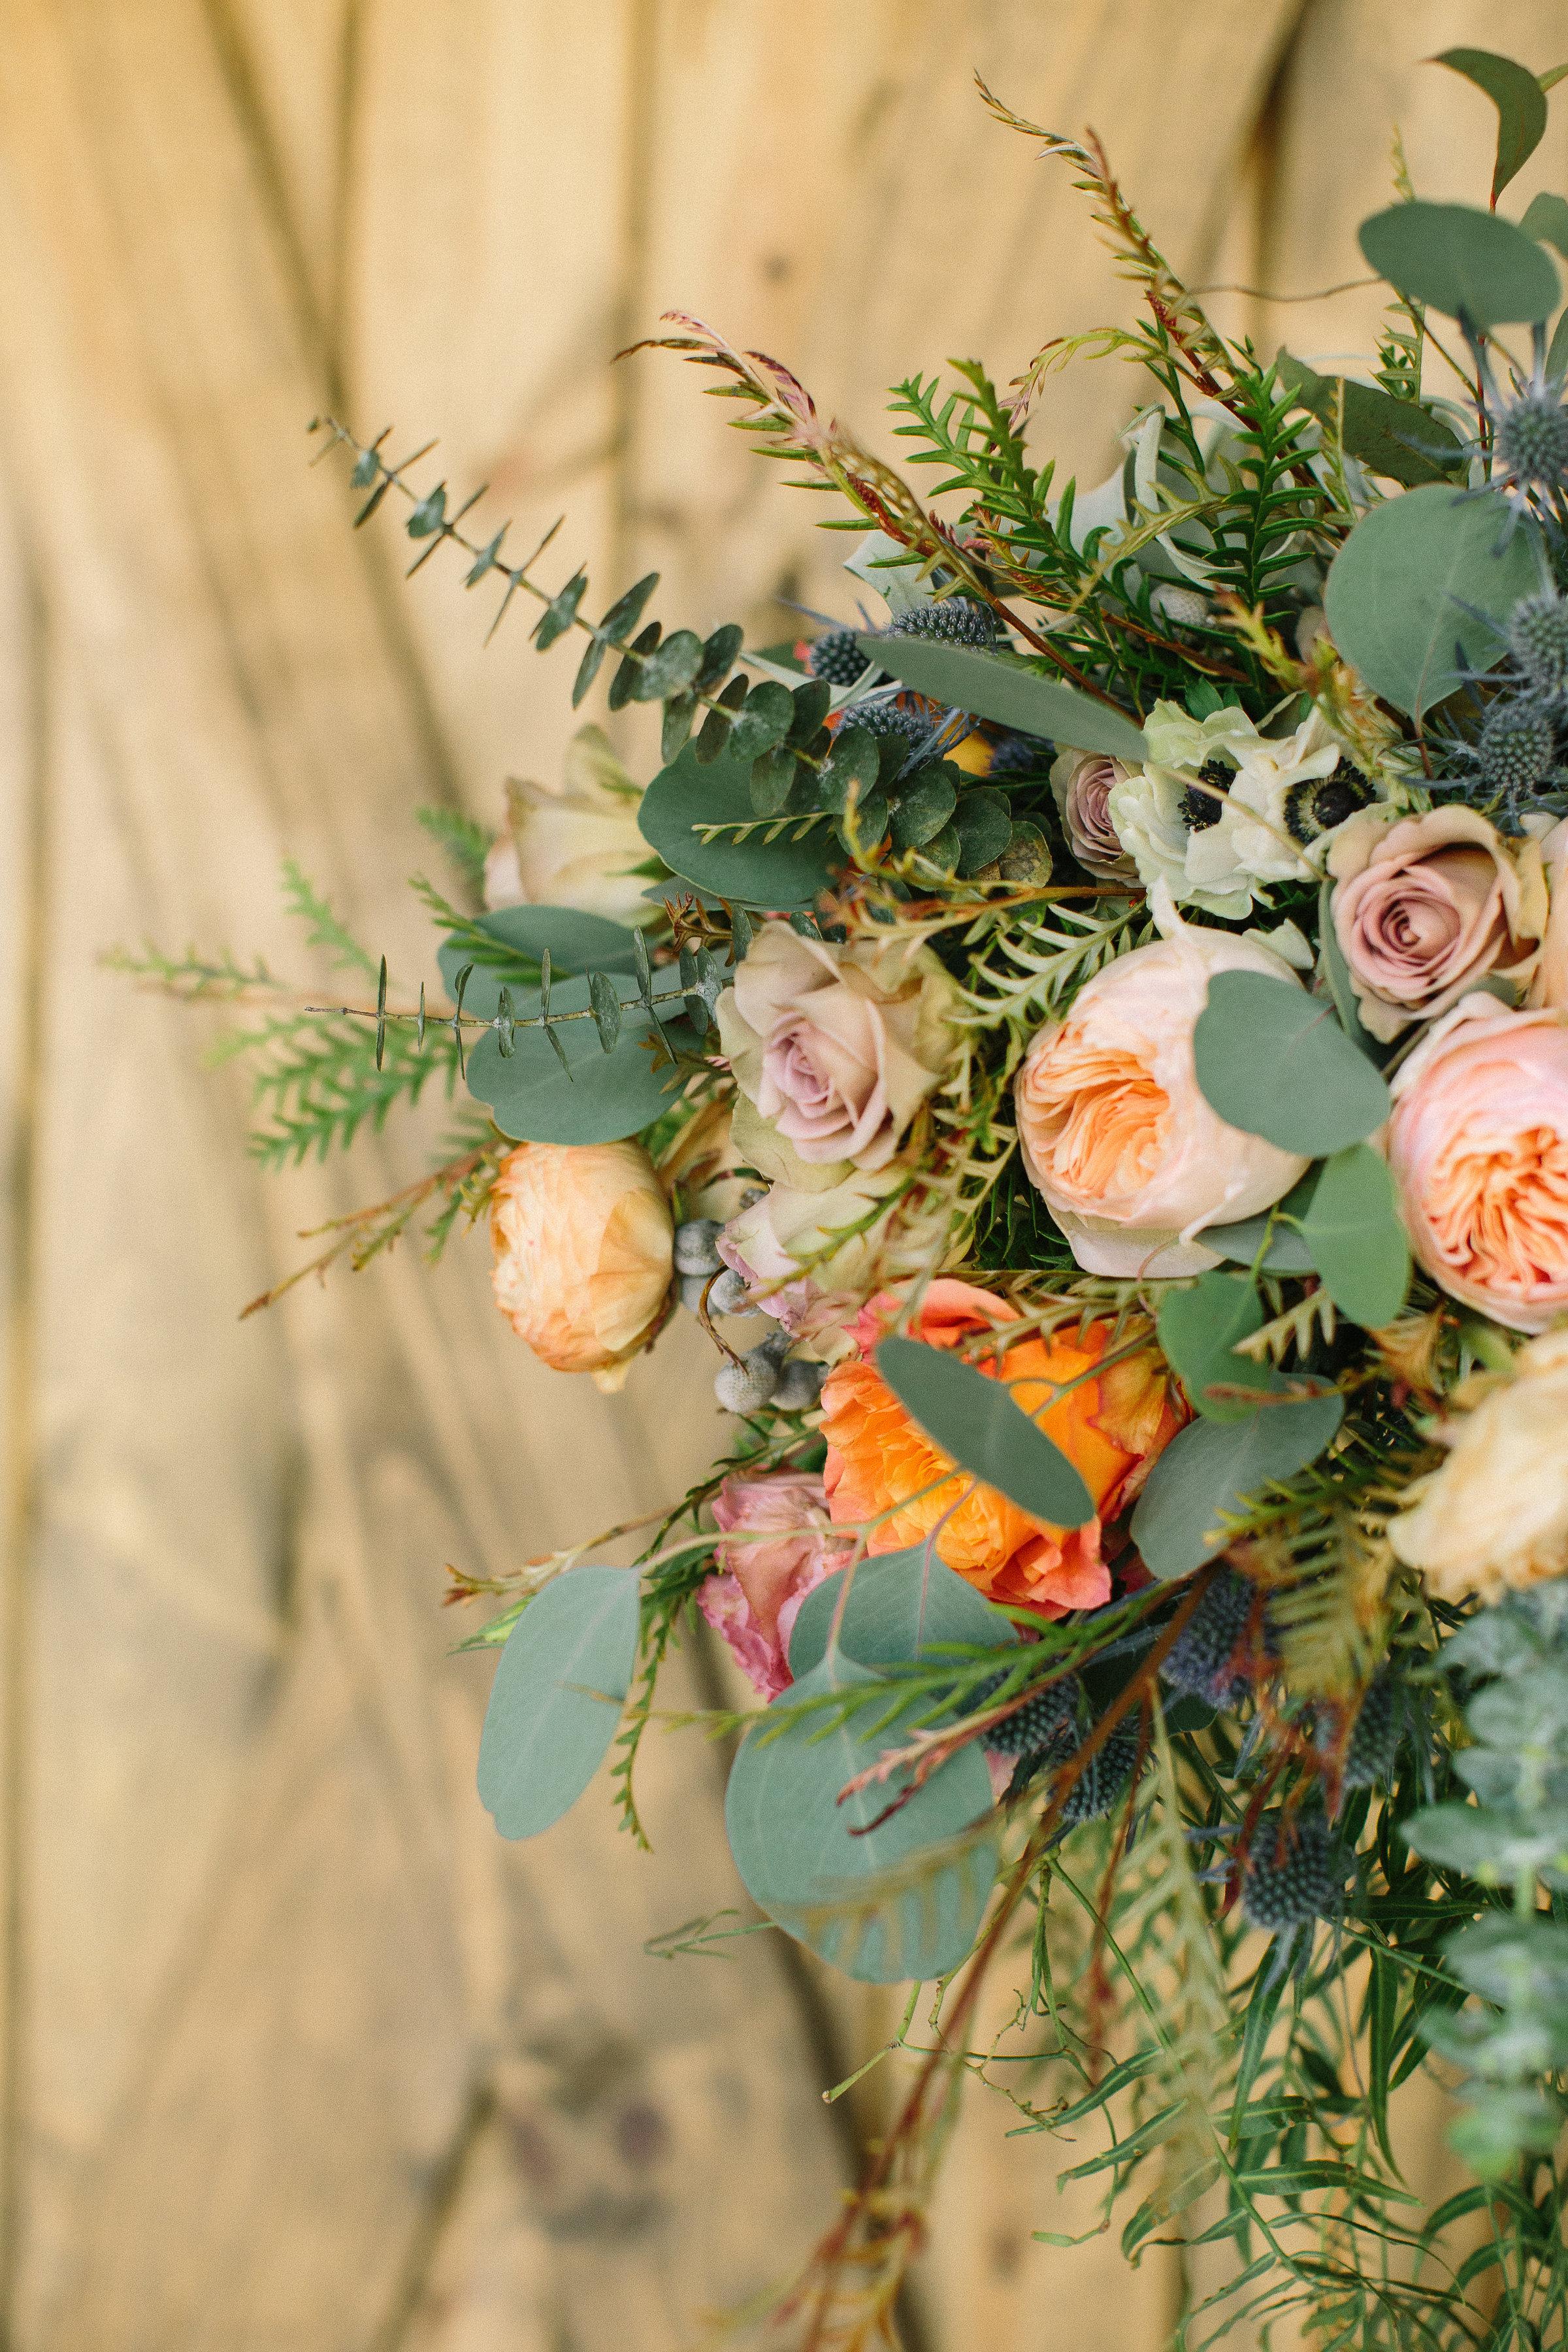 Ellen-Ashton-Photography-Peach-Creek-Ranch-Weddings-Wed-and-Prosper48